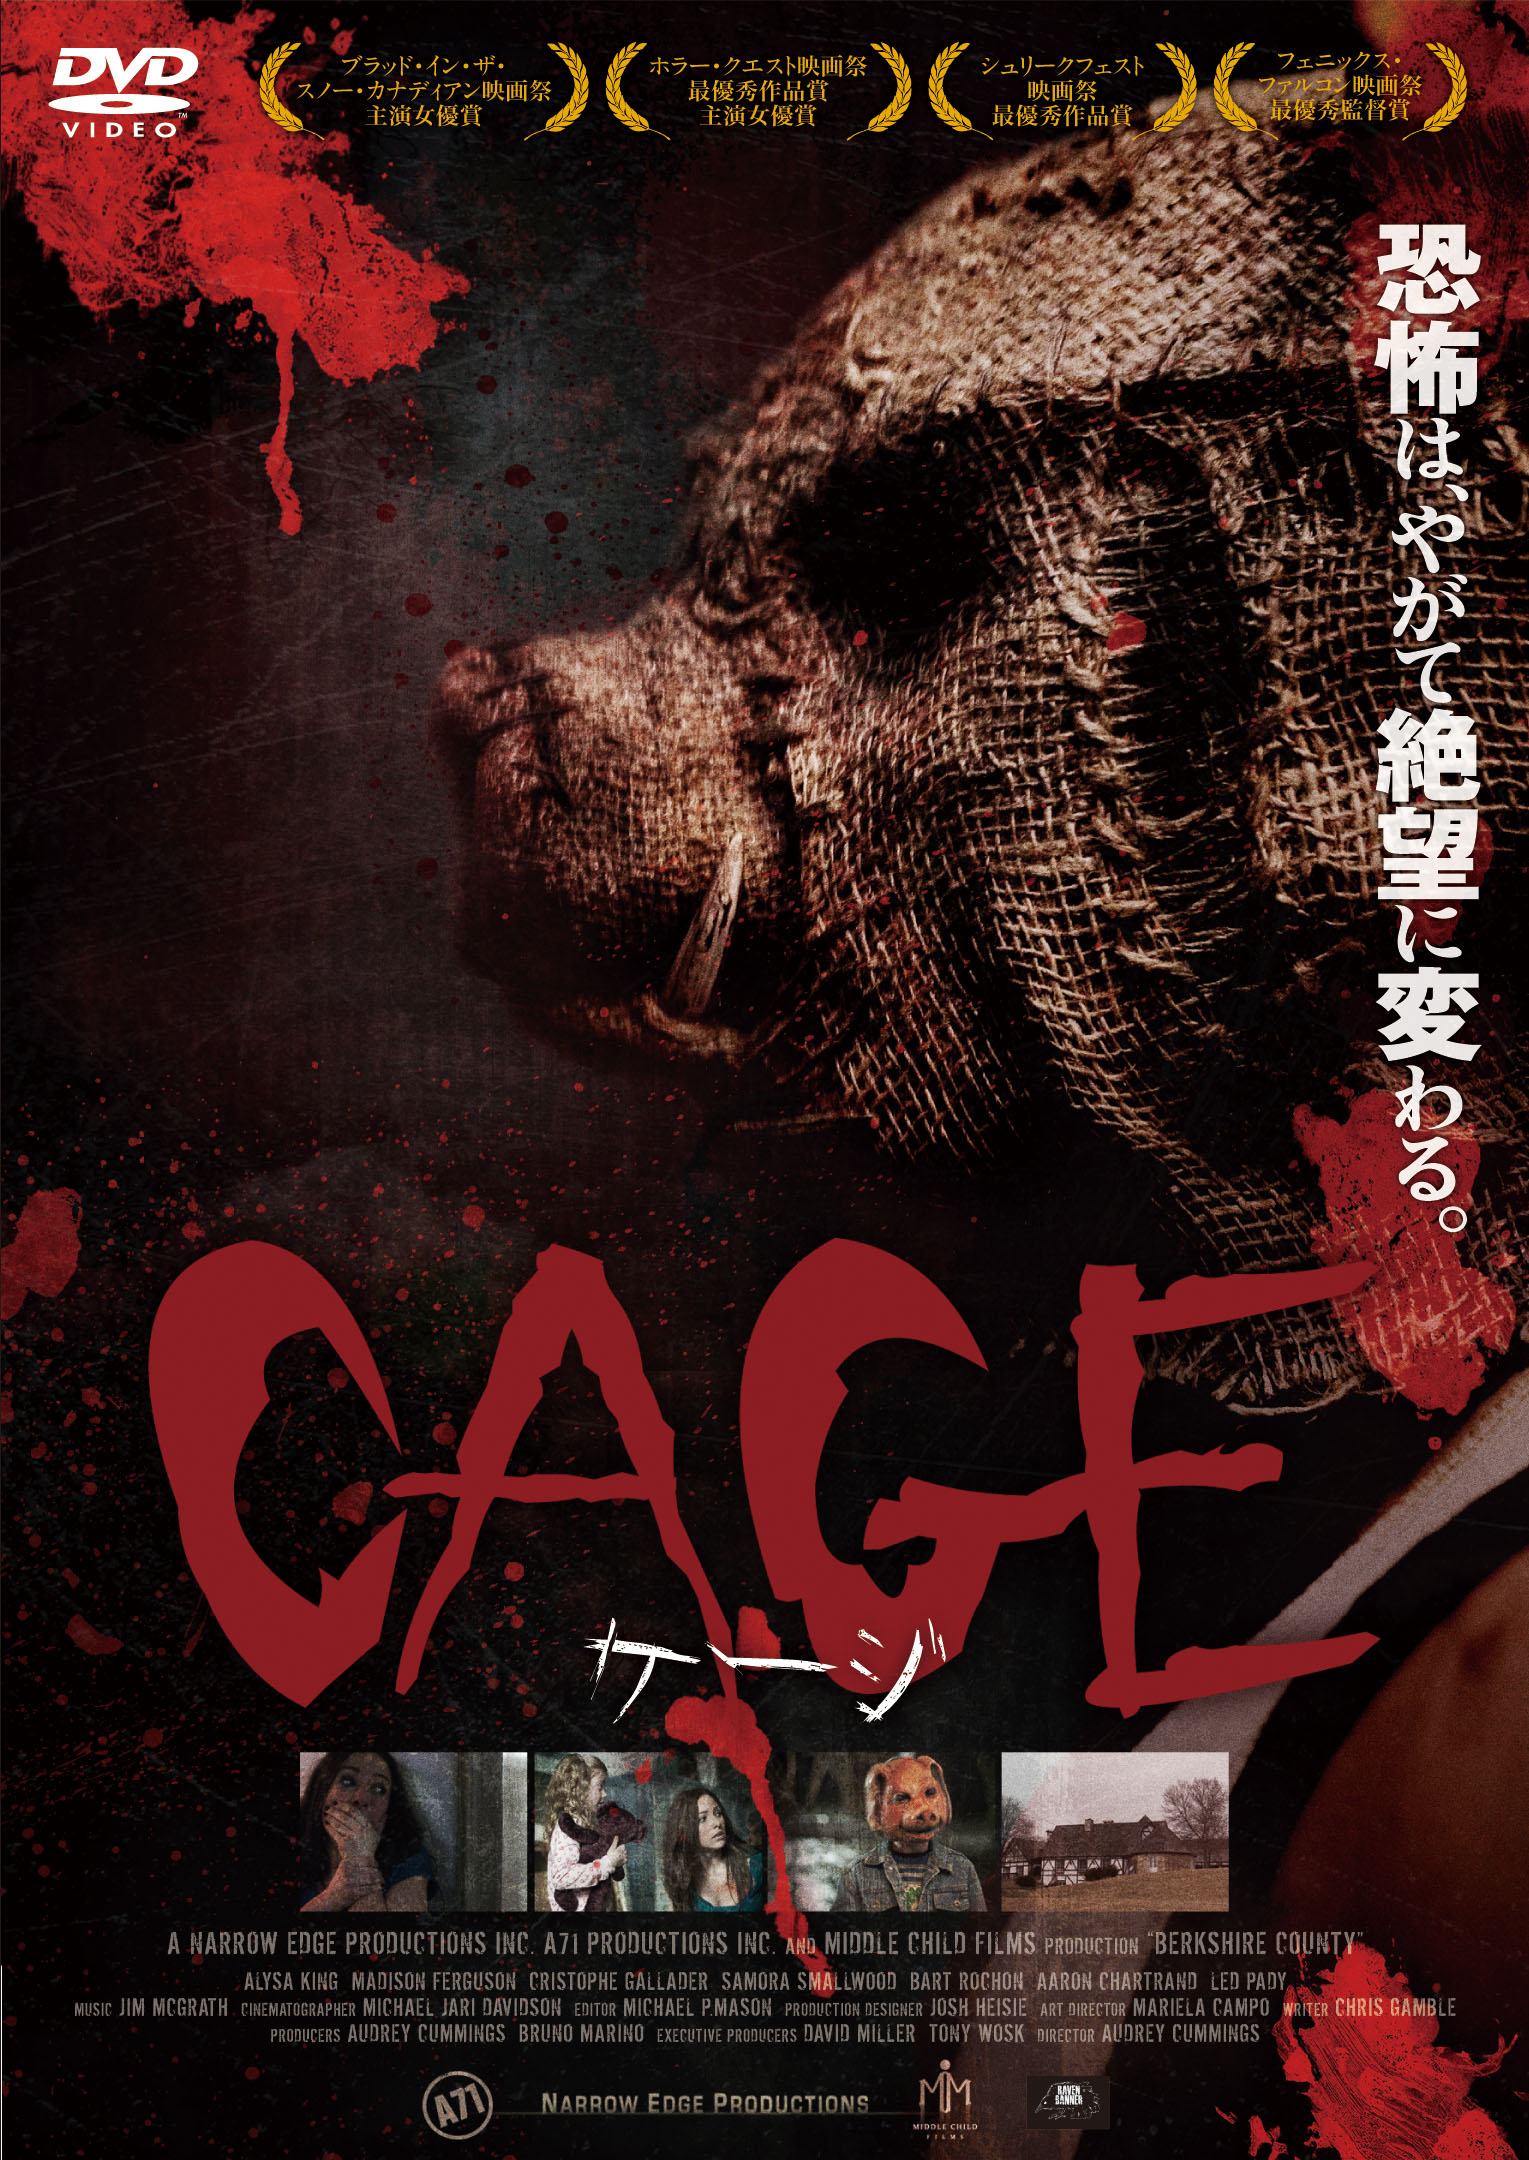 cage_jacket.jpg